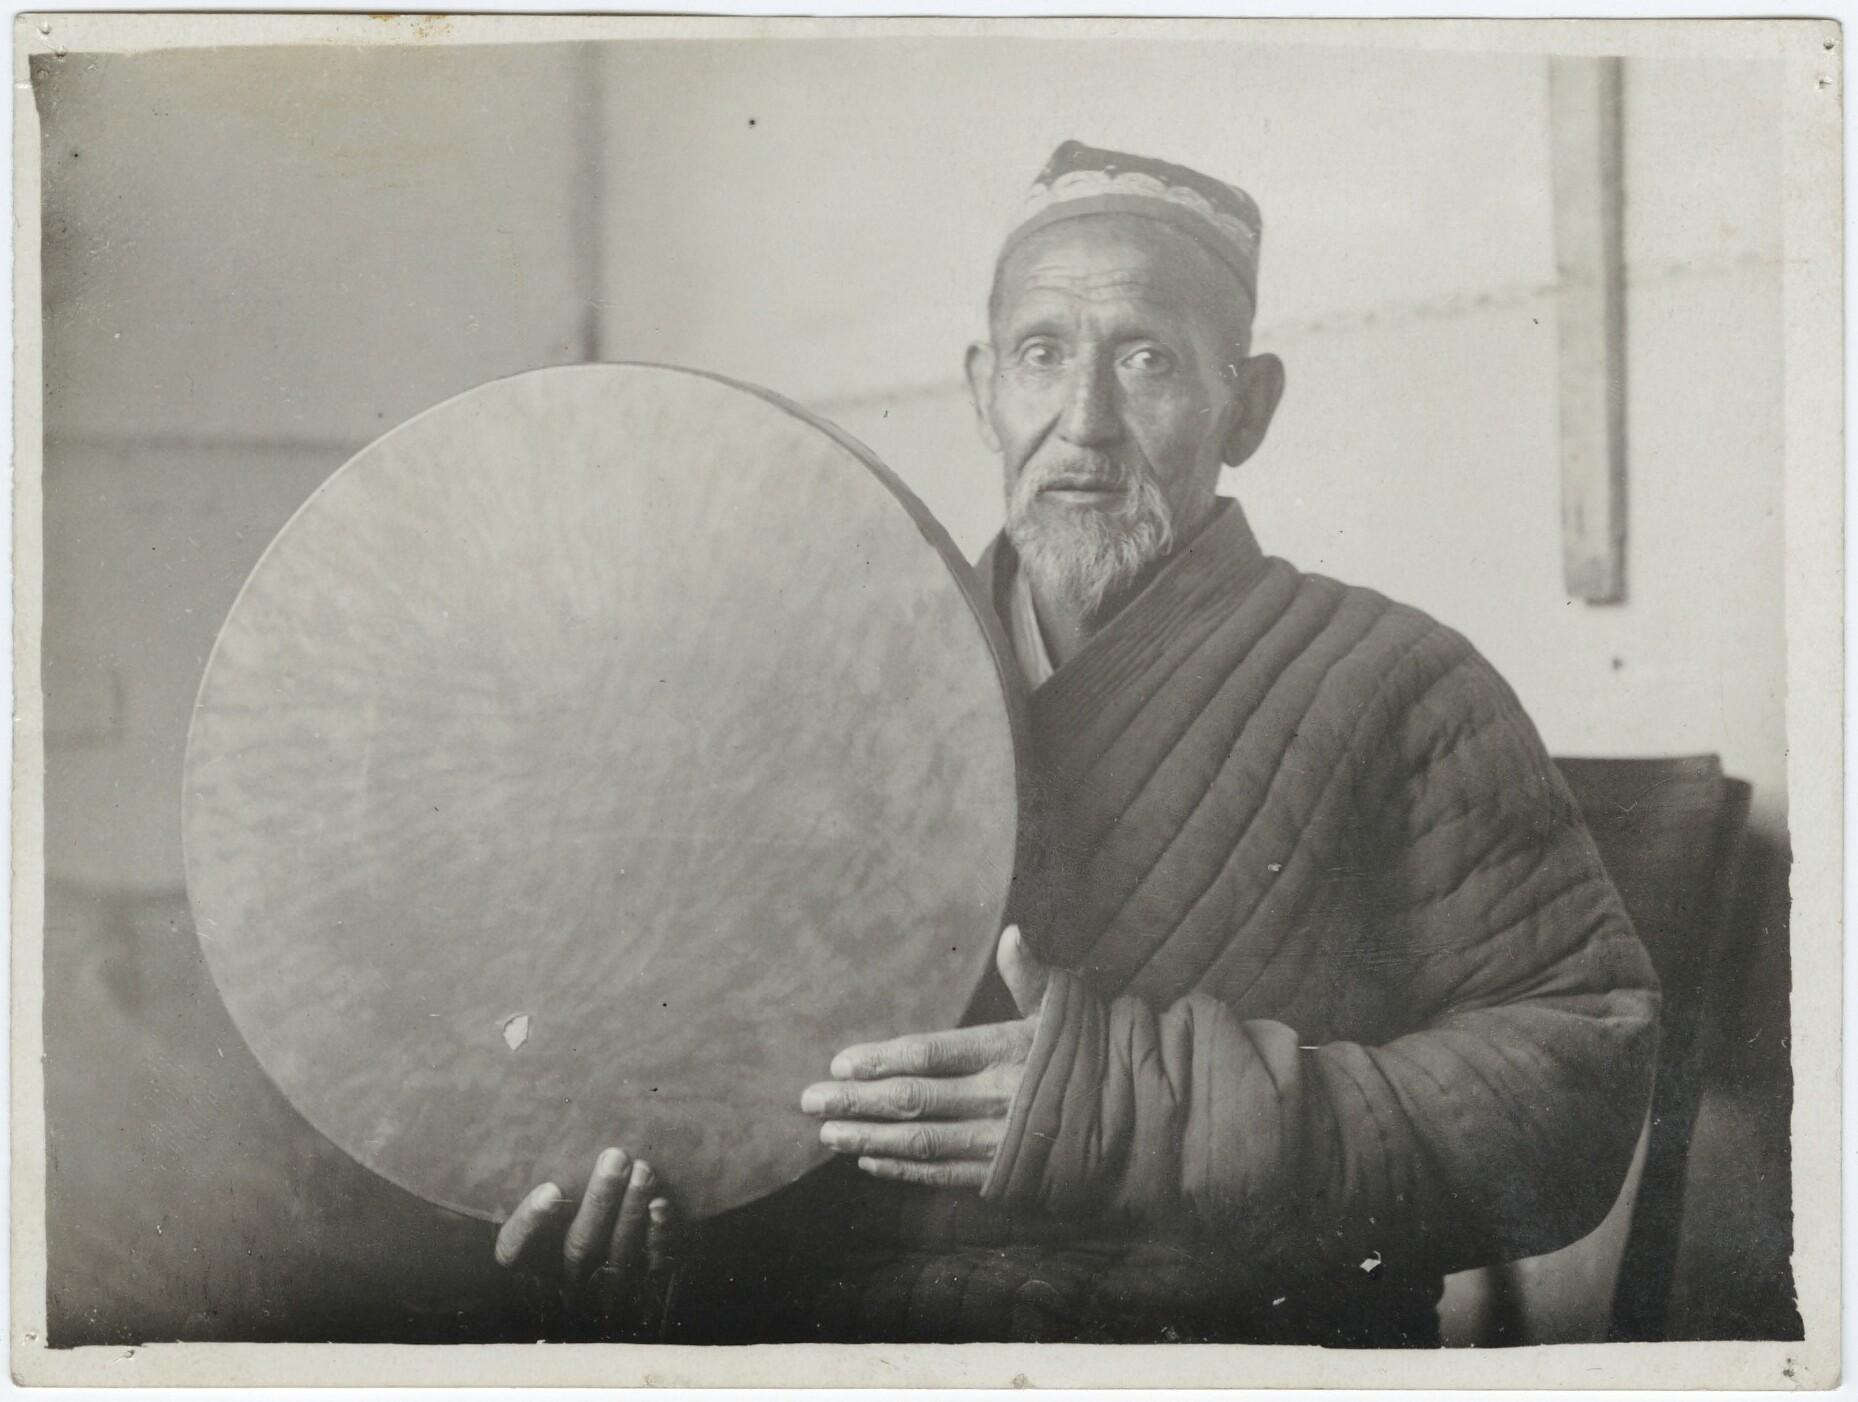 Austa Alim Kamilov, famous drummer of the Uzbek Muscial Theatre, Soviet Central Asia